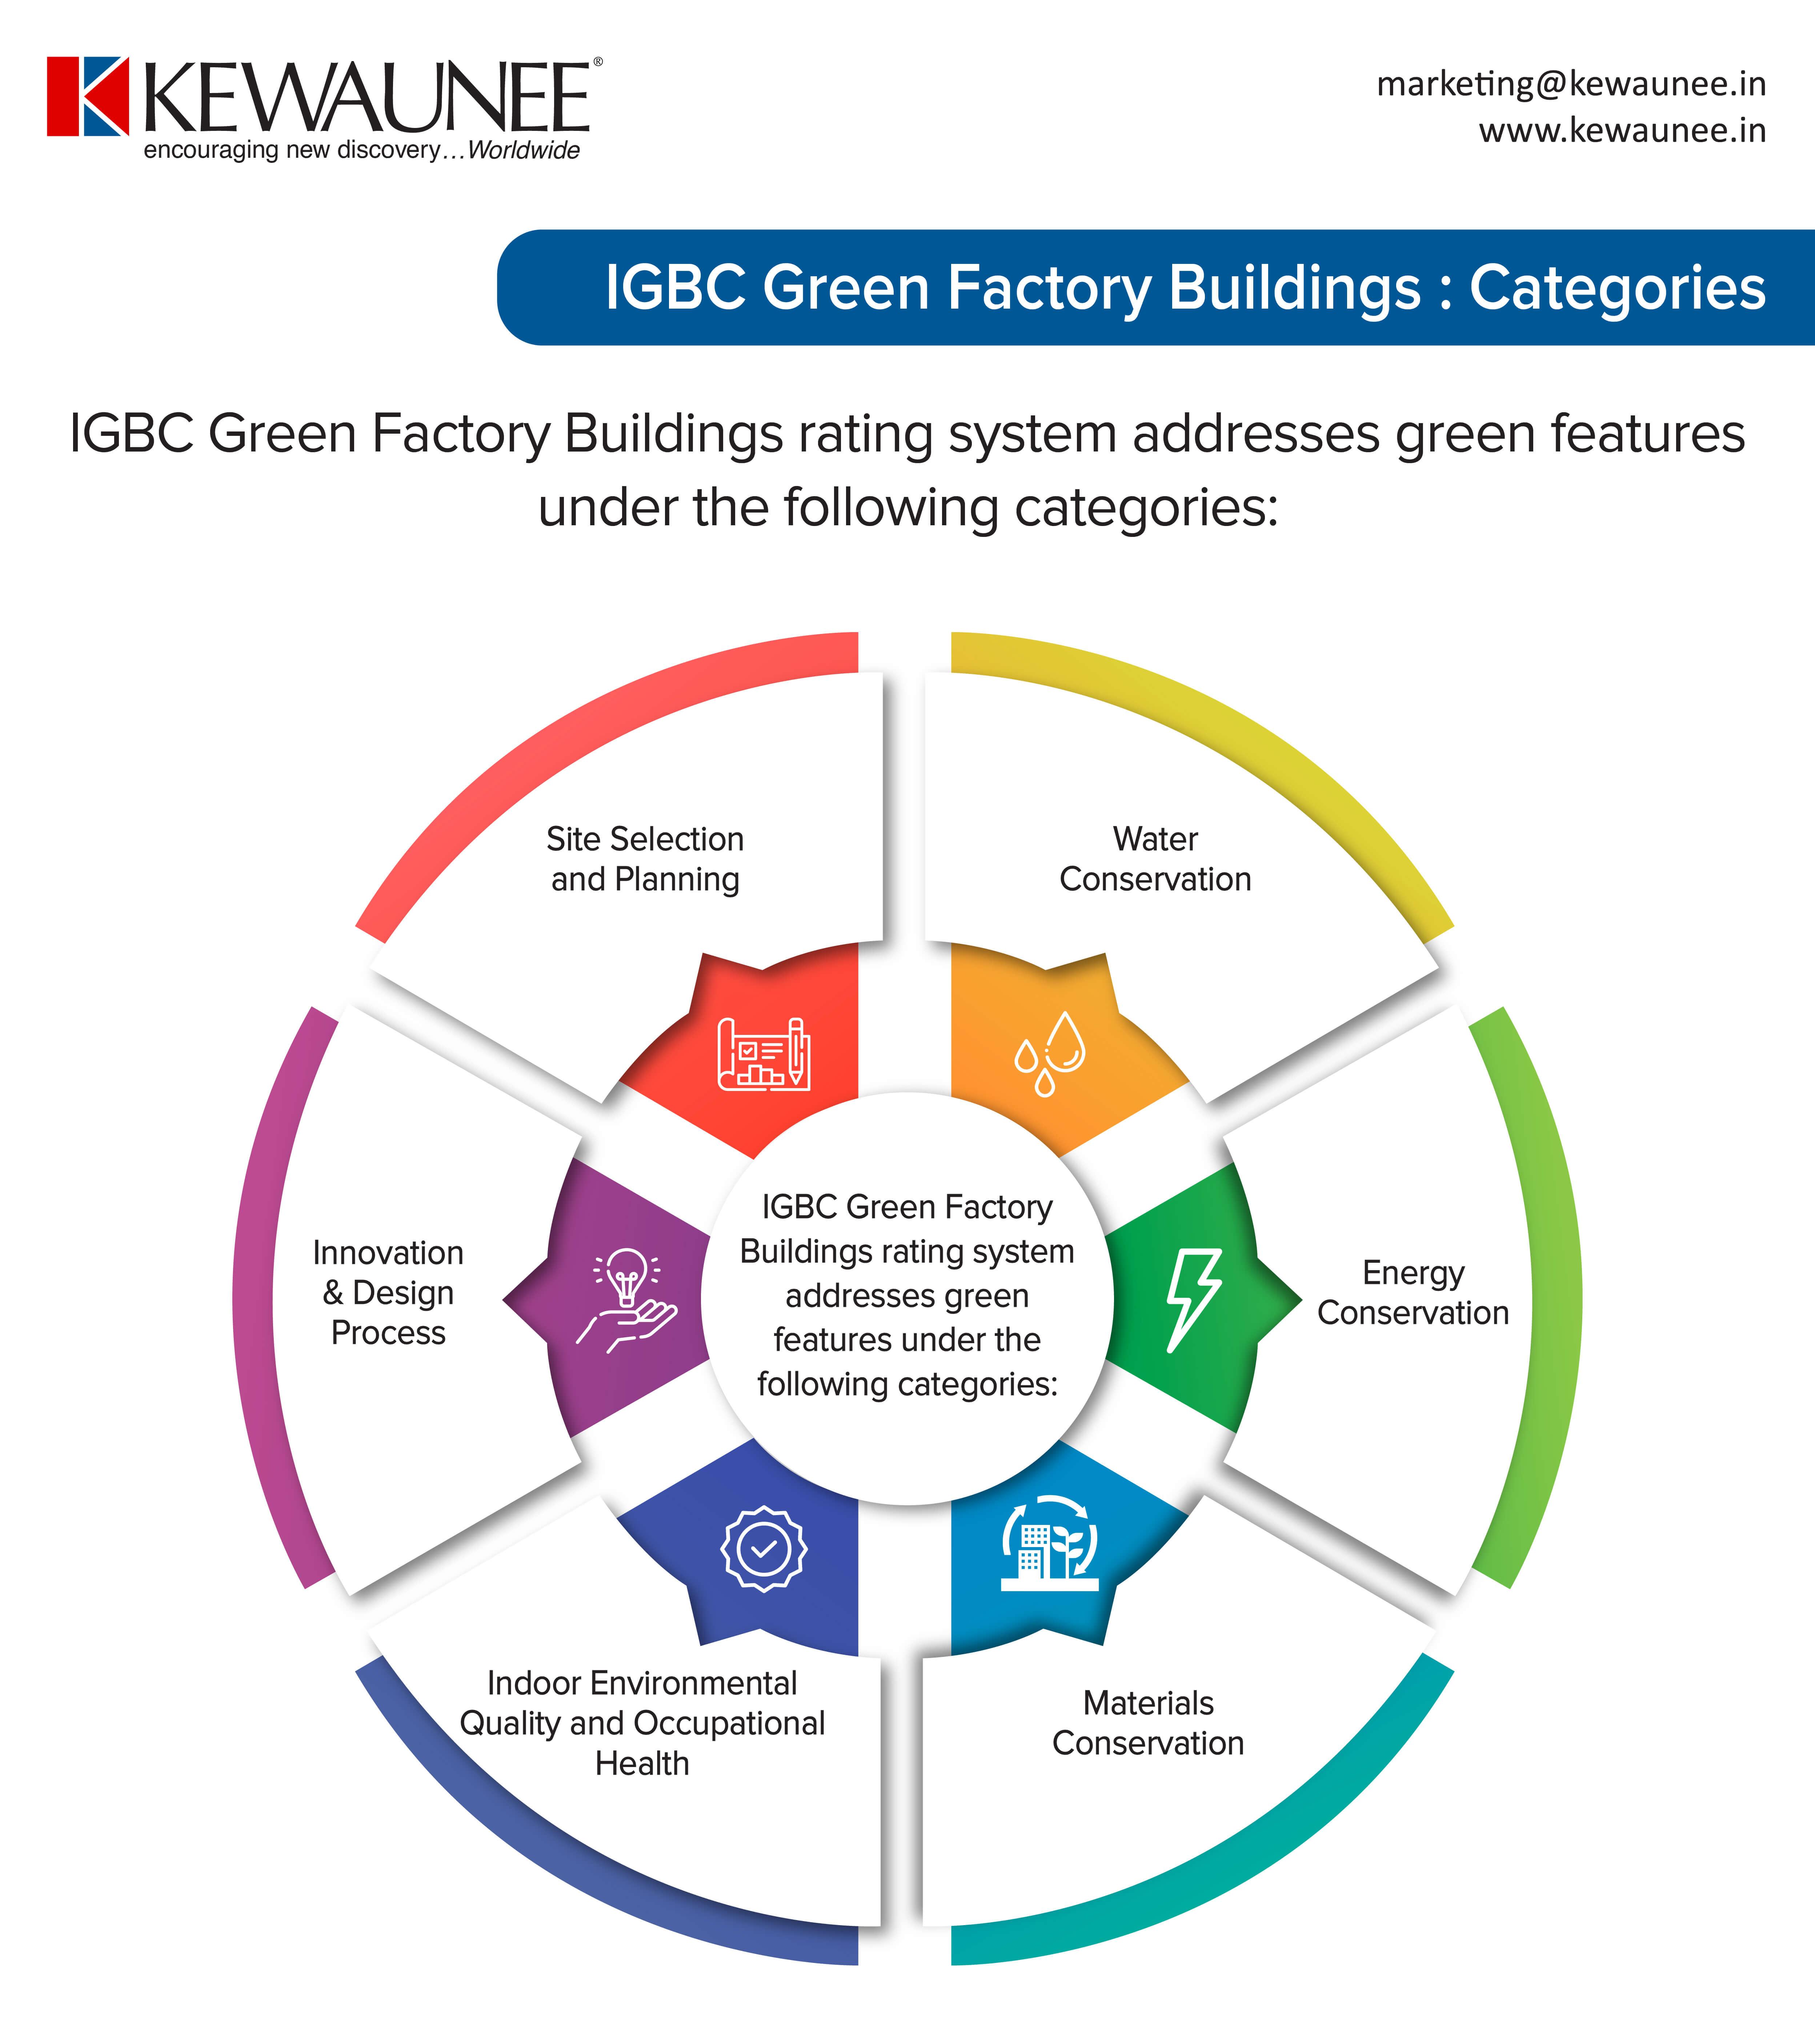 IGBC Green Facility Buildings